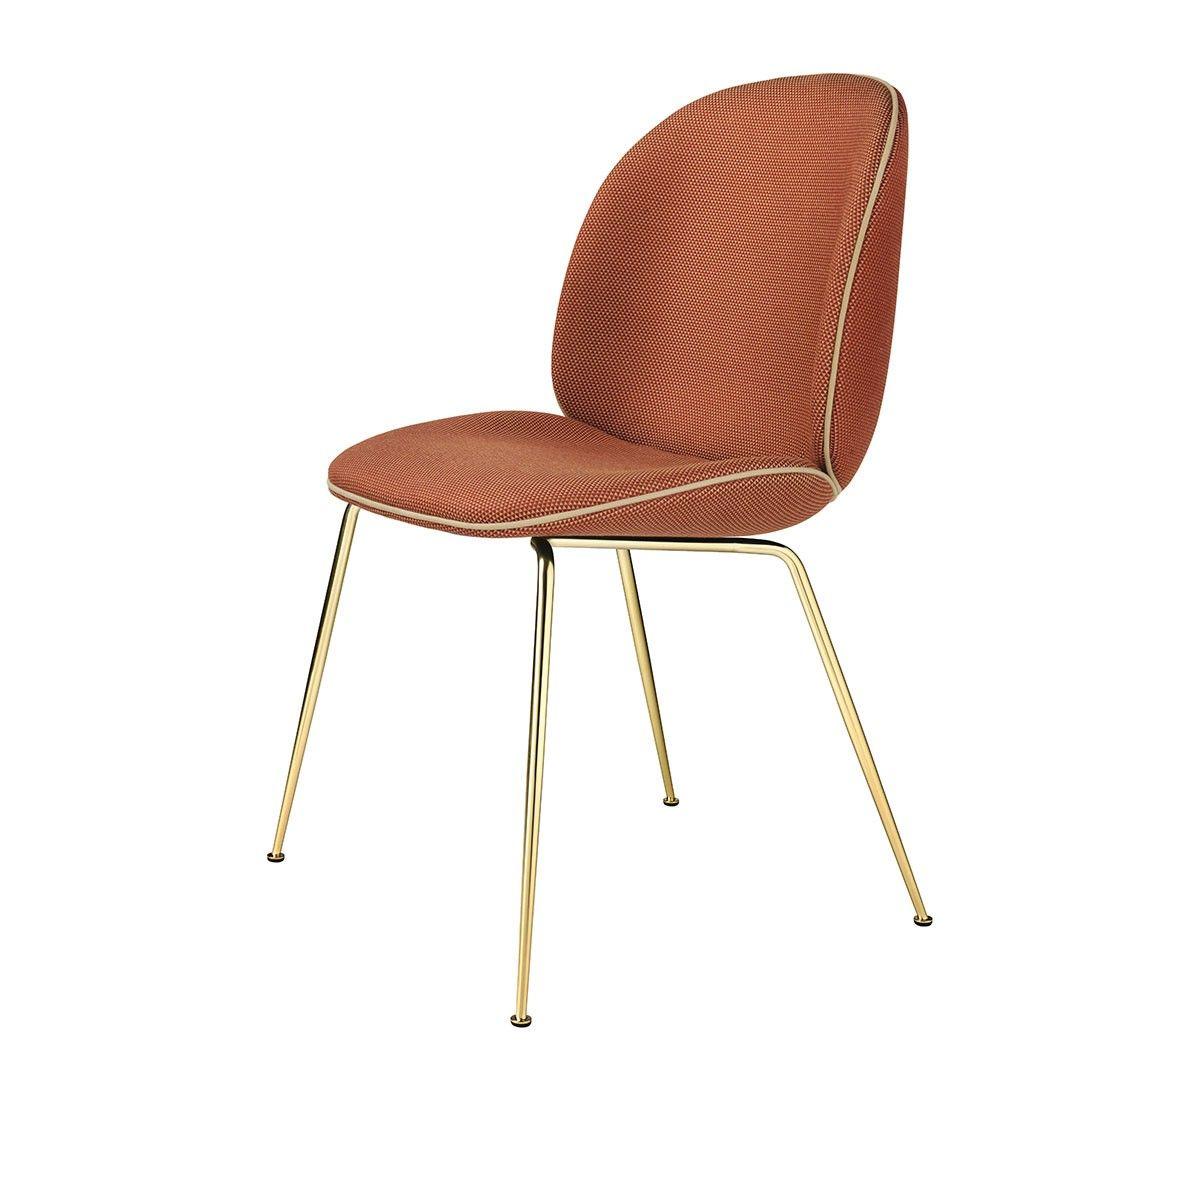 Chaise Beetle Textile Jabana Rouge Pieds Laiton Gubi Gubi Chaise Furniture